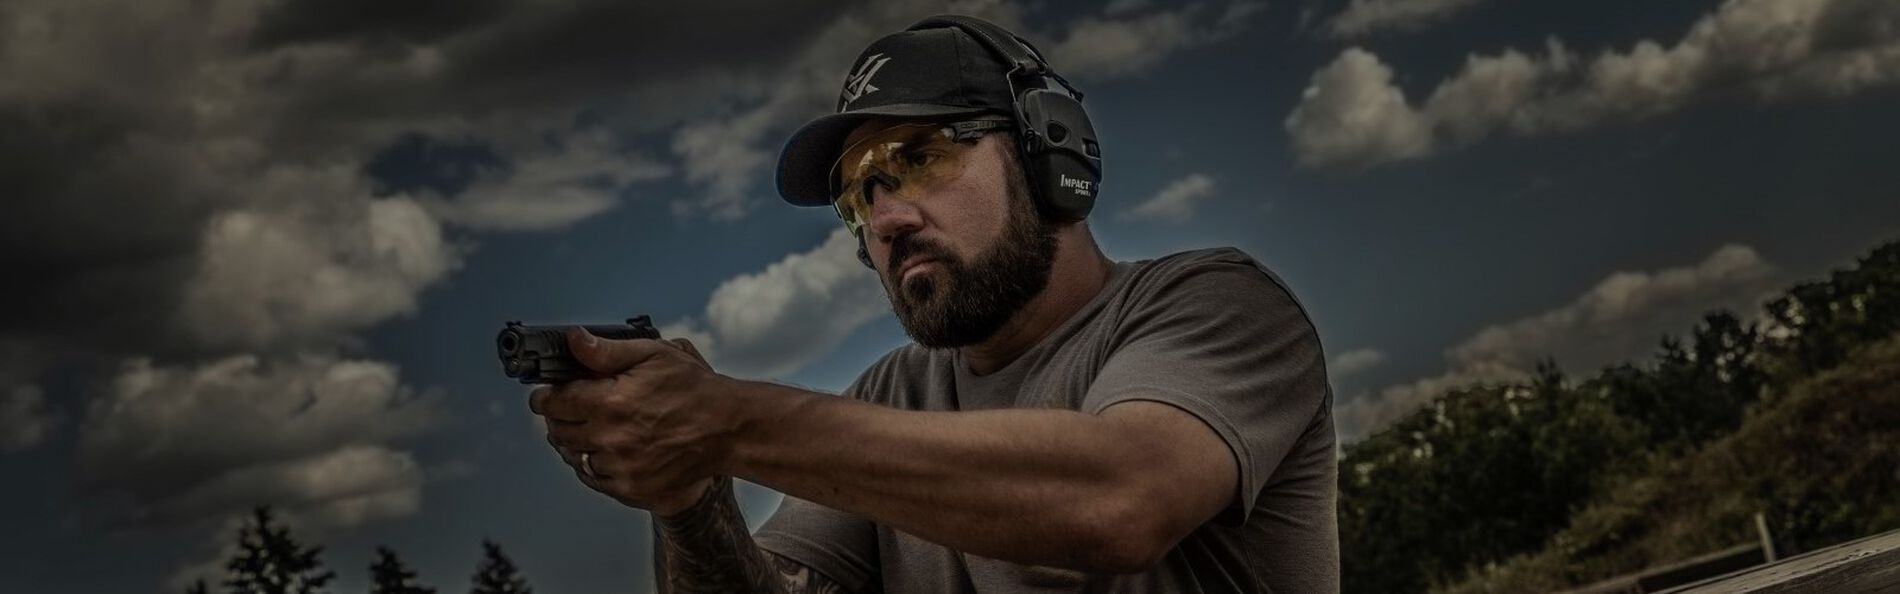 josh froelich shooting a handgun outside